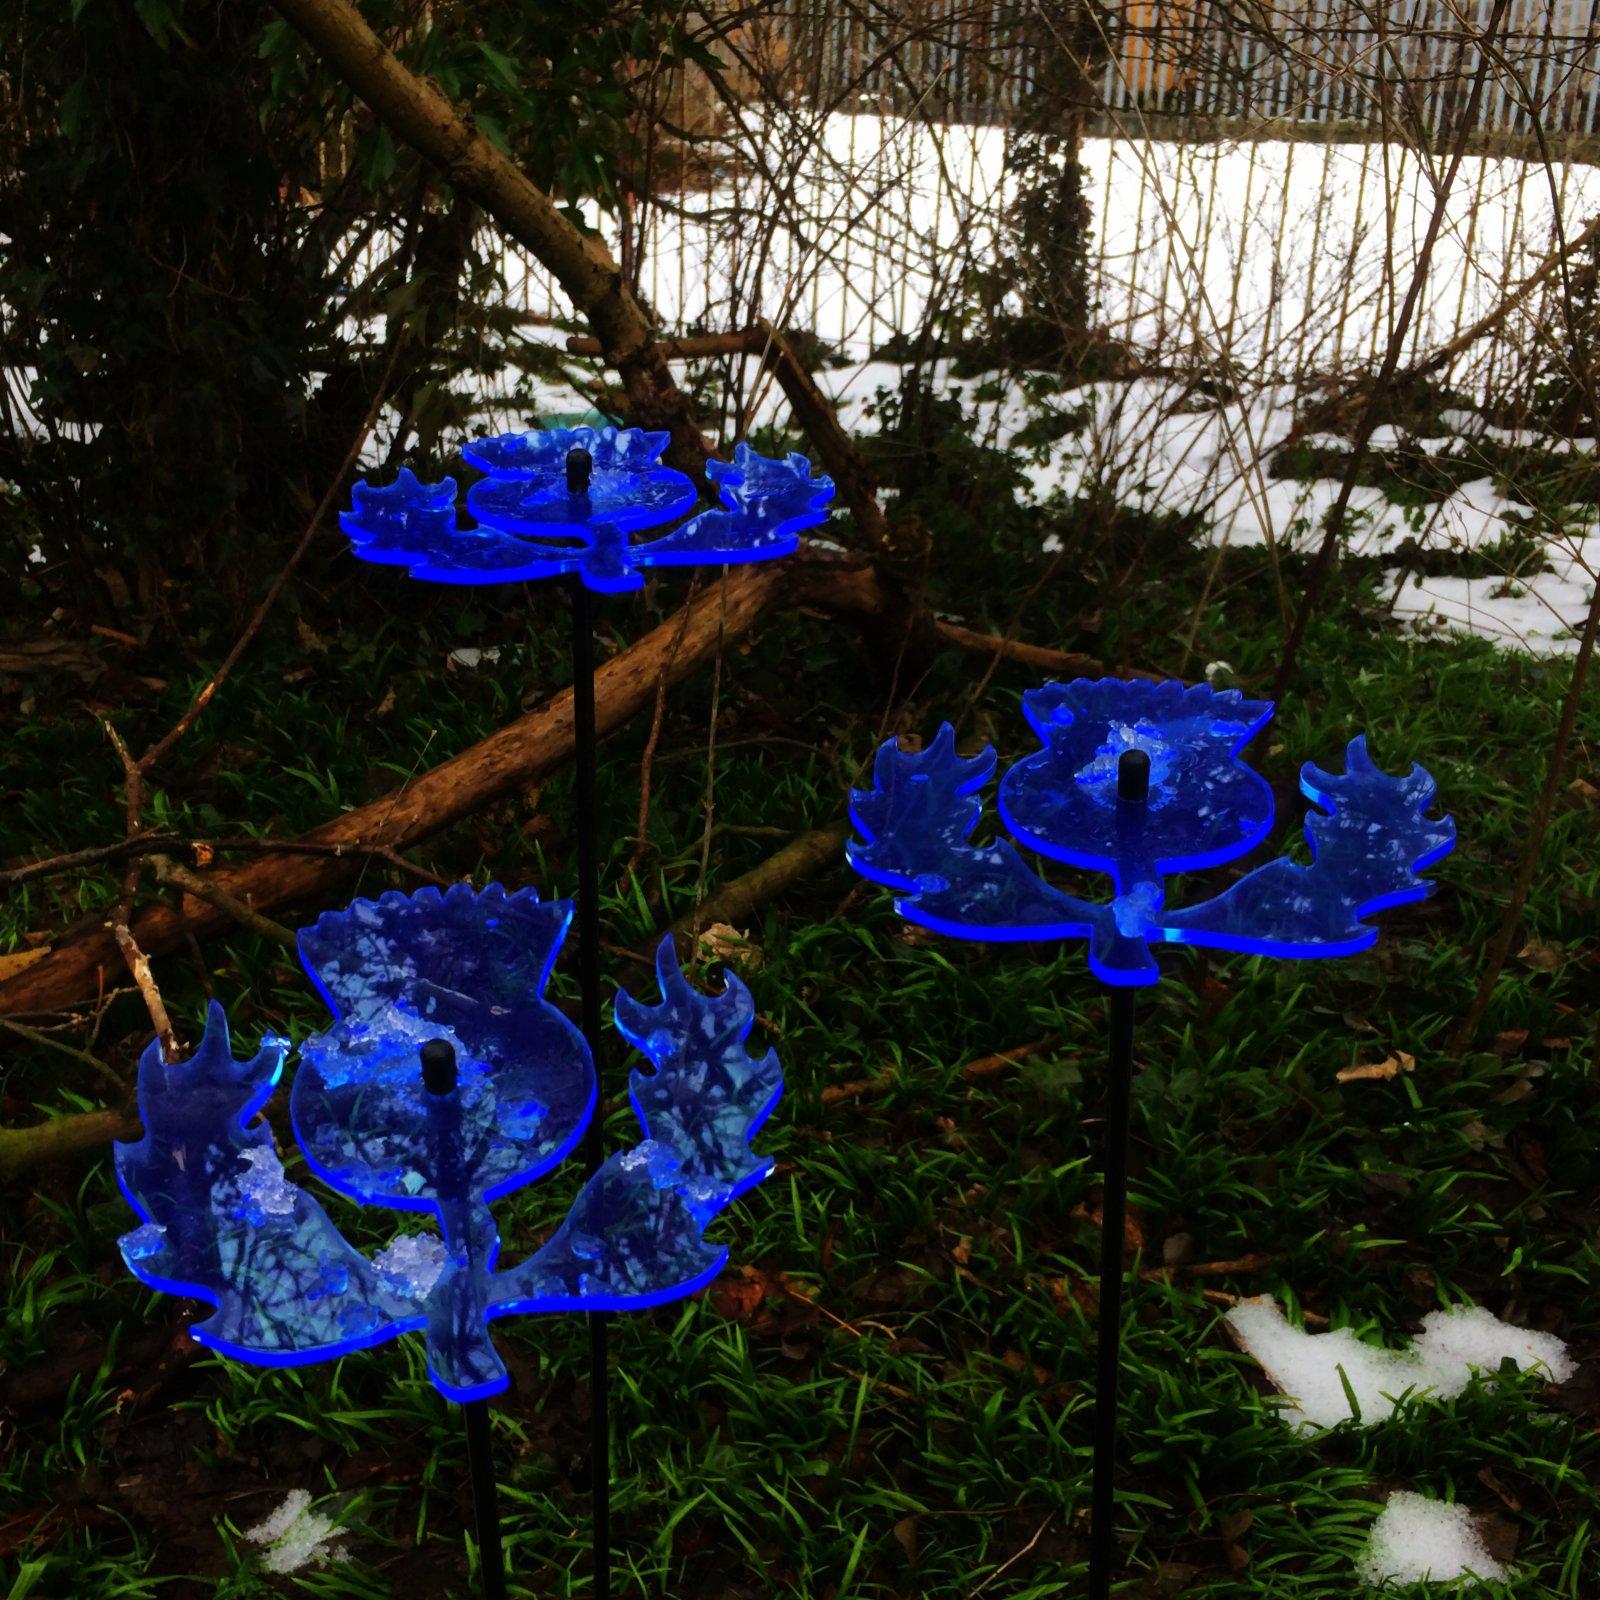 SunCatcher Set of 3: Scottish Thistle | 150mm / 5,9'' Ø Fluorescent Garden Ornament | Glowing Garden Decoration on Stick | Innovative Home Decor for Outdoor Garden Balcony Pathway, Colour:Blue